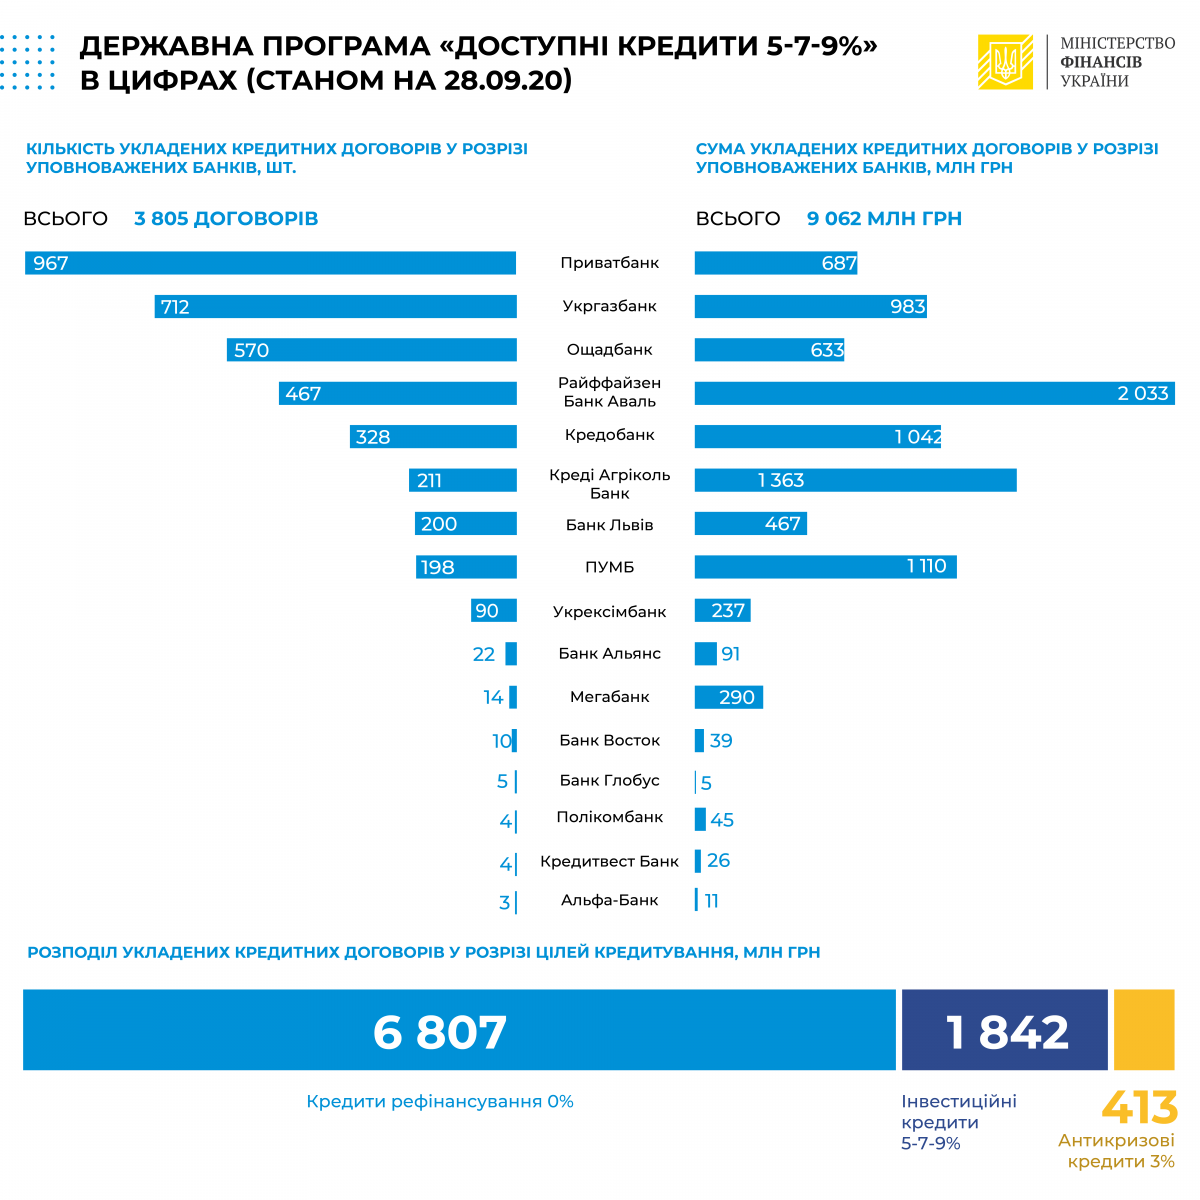 Обсяги кредитів «5-7-9%» перевищили 9 млрд грн